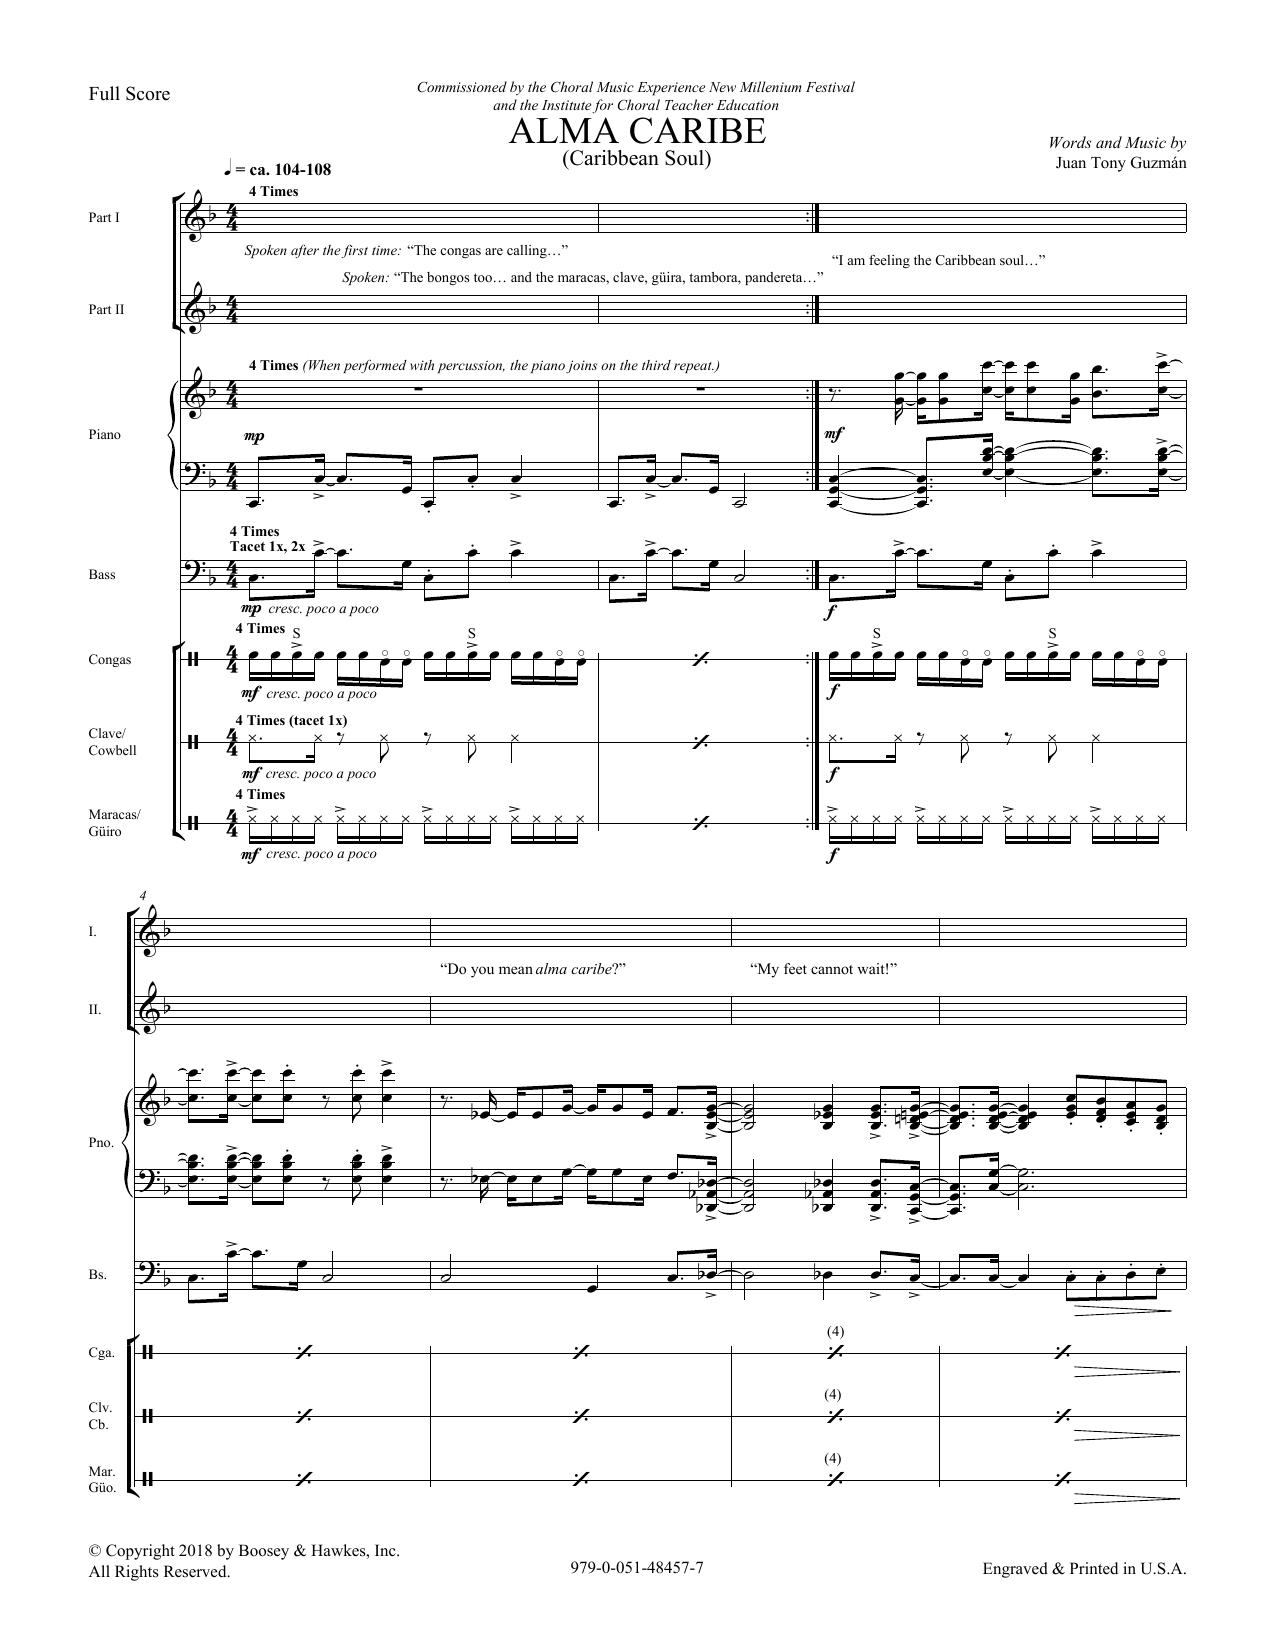 Download Juan Tony Guzman 'Alma Caribe (Caribbean Soul) - Score' Digital Sheet Music Notes & Chords and start playing in minutes